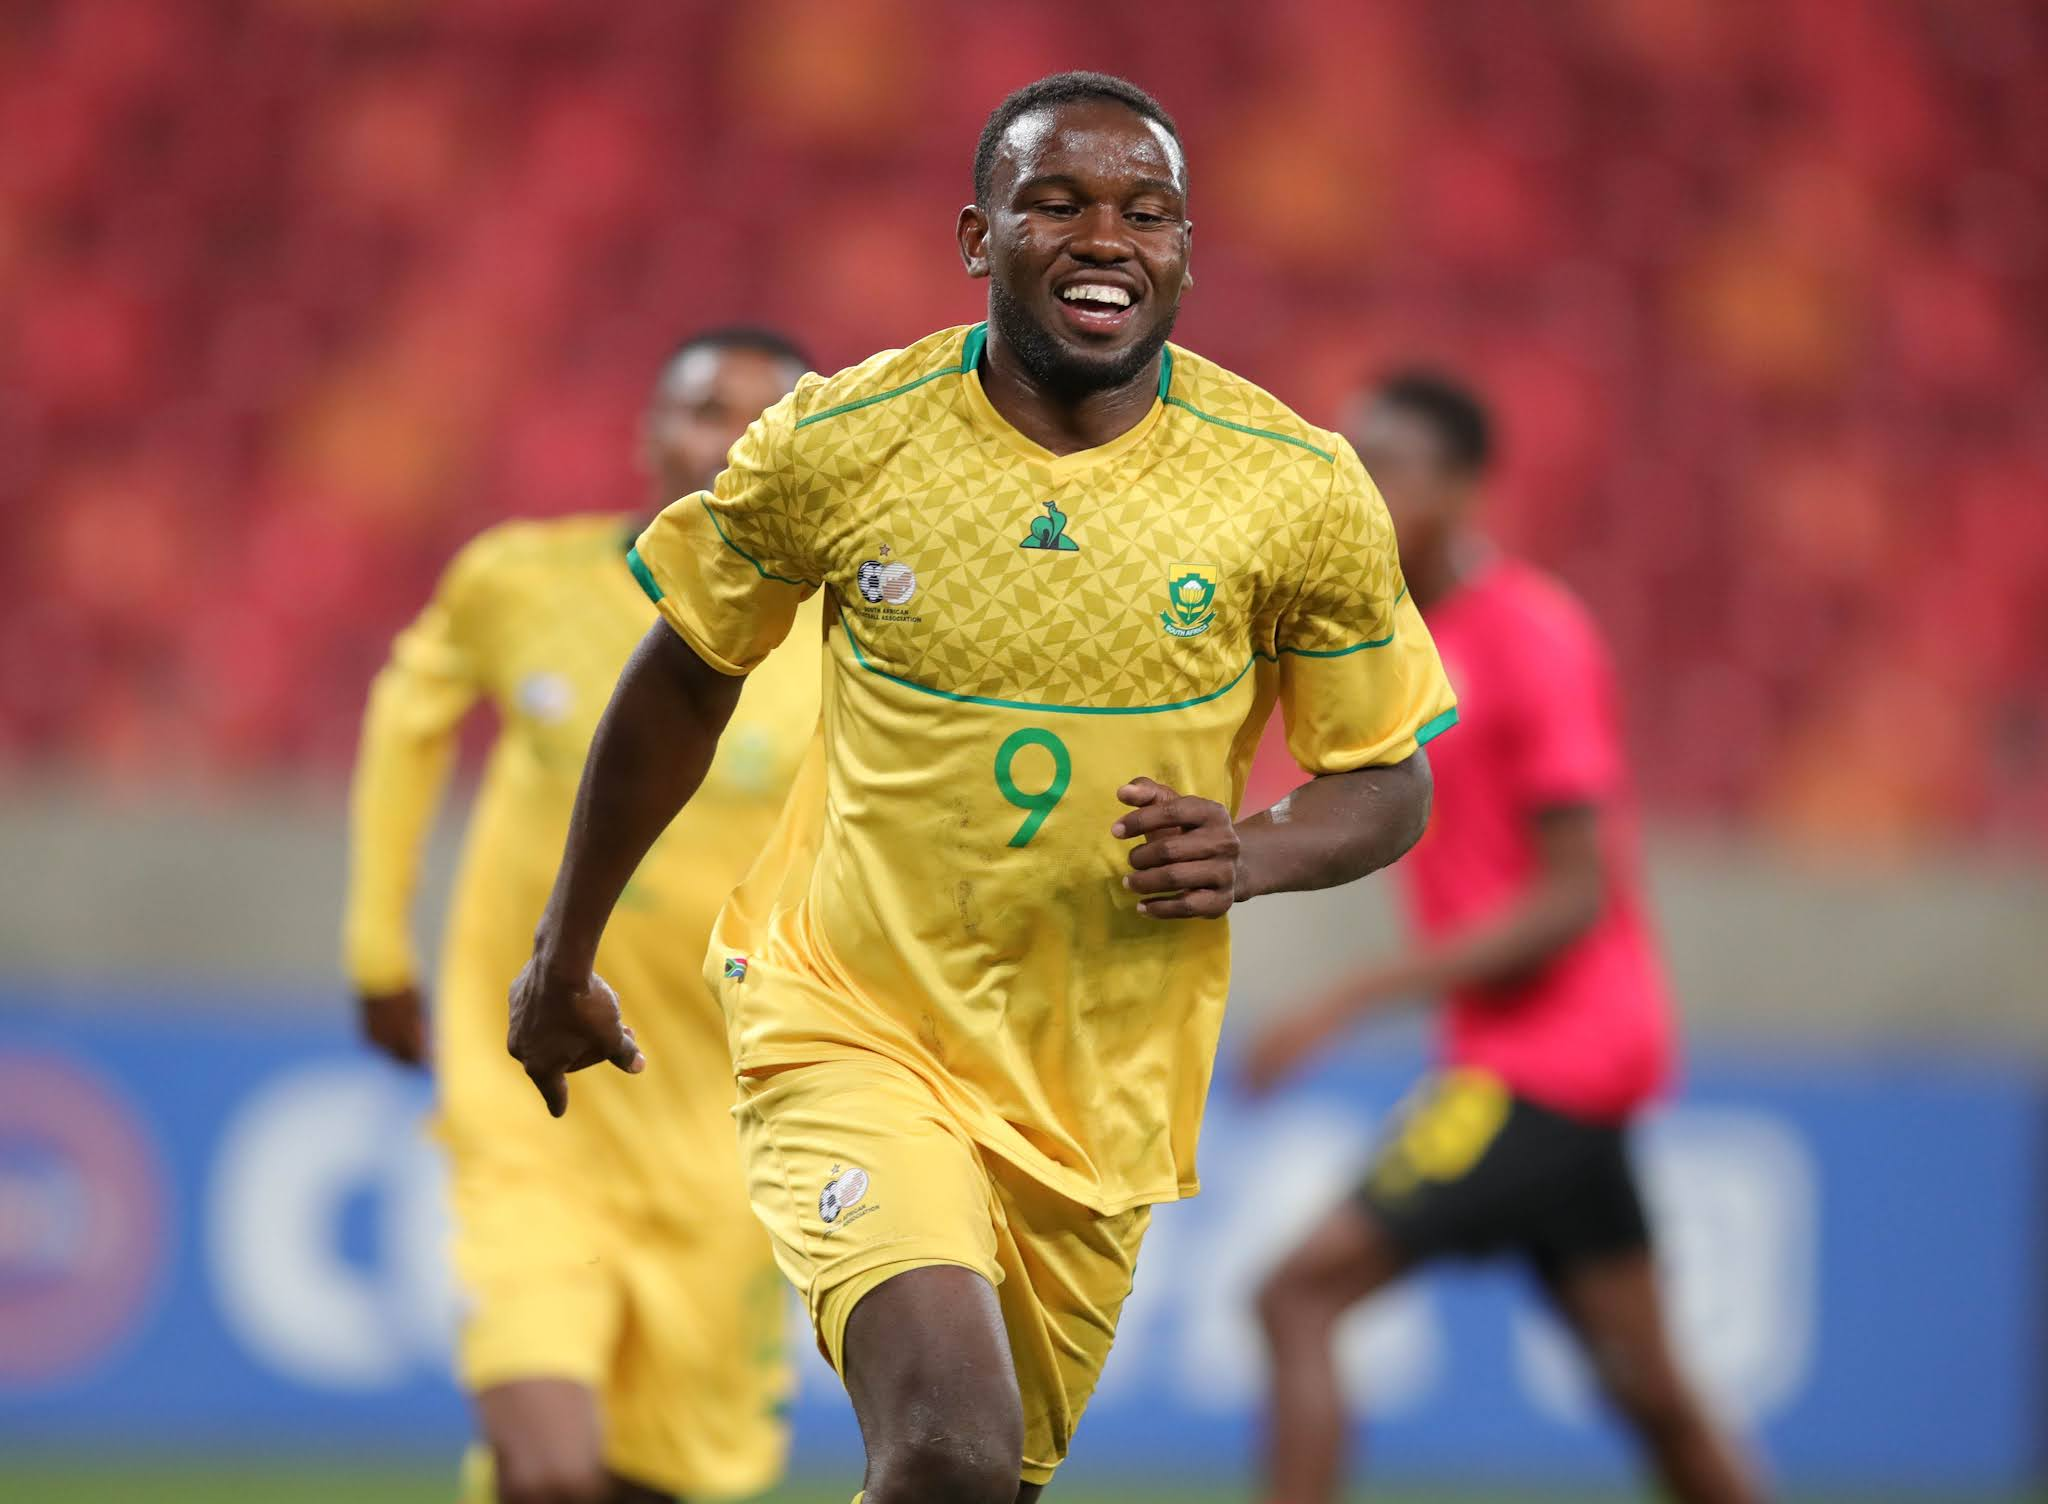 Bafana Bafana forward Victor Letsoalo